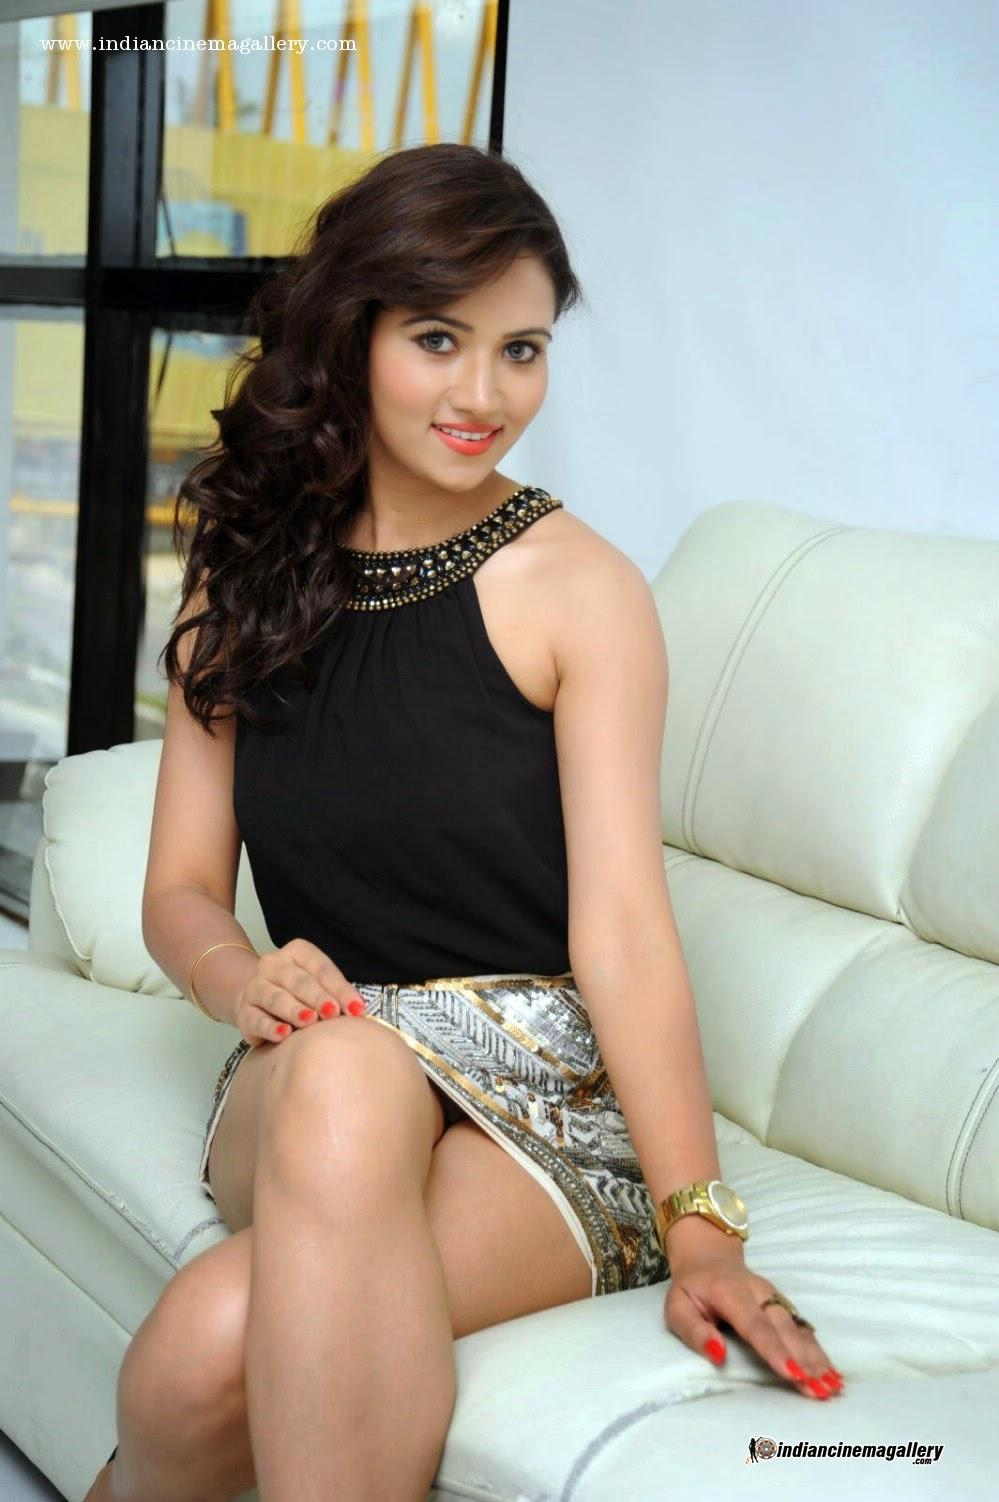 Chennai escorts independent chennai escorts escorts in chennai call girls in chennai wwwchennai4escortscom - 5 5